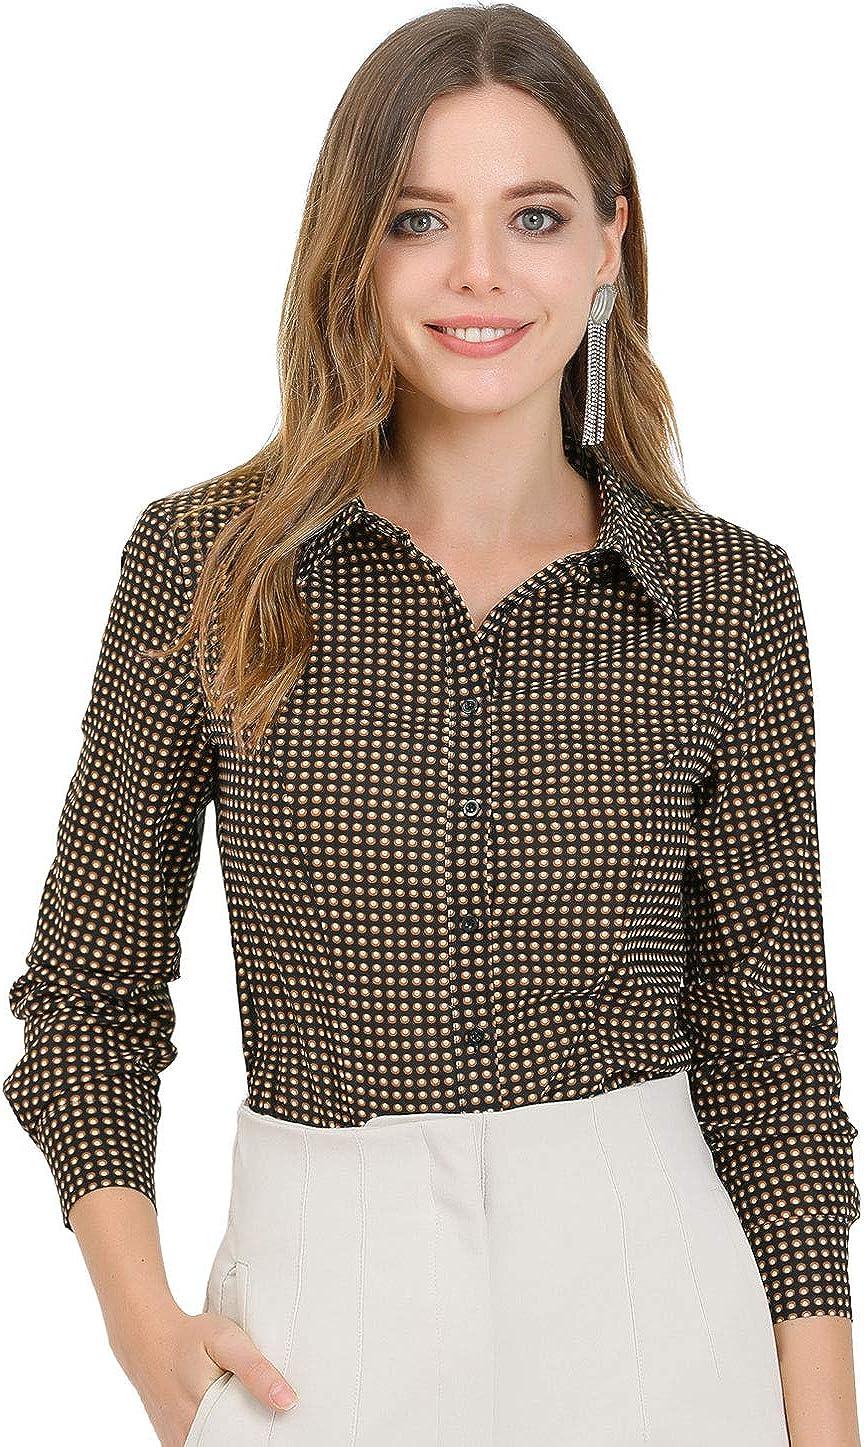 Allegra K Women's Office Work Point Collar Polka Dots Printed Blouse Button Down Shirt